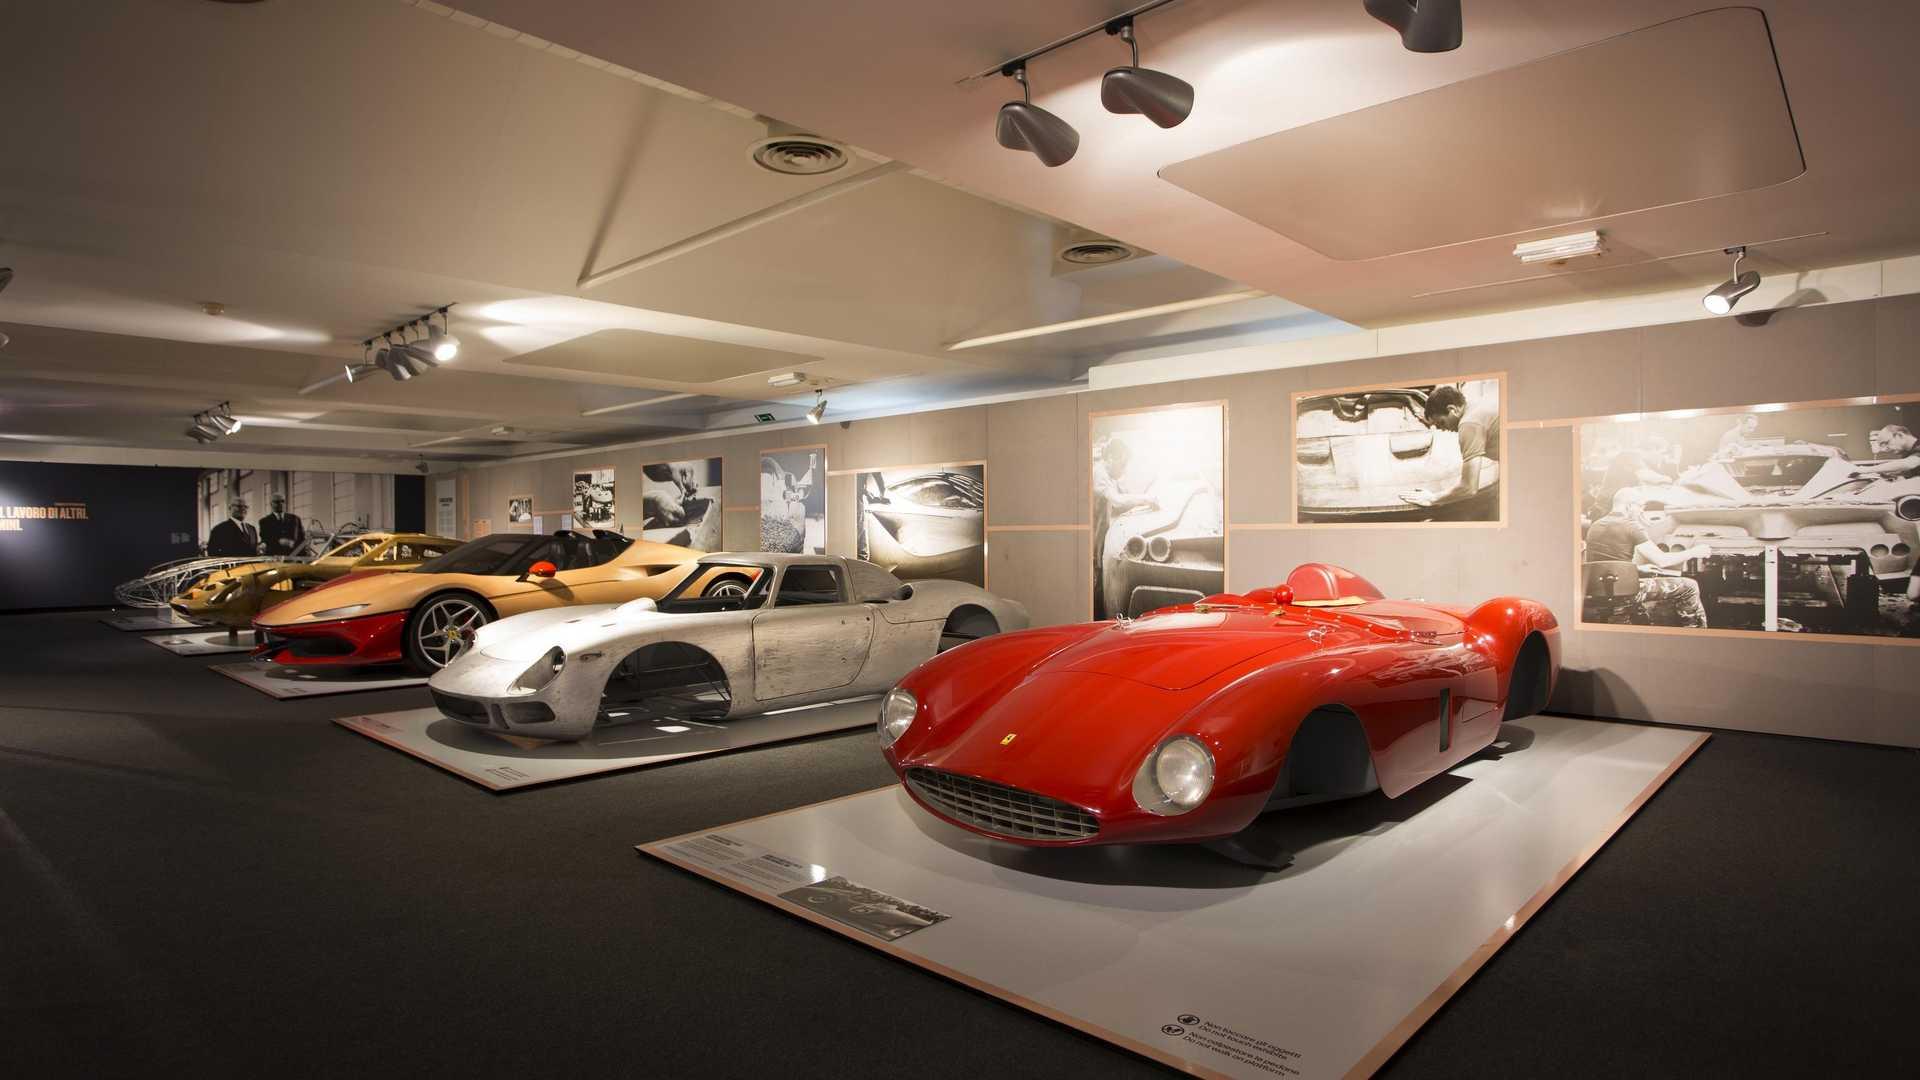 Expanded_Ferrari_Museum_in_Maranello_09